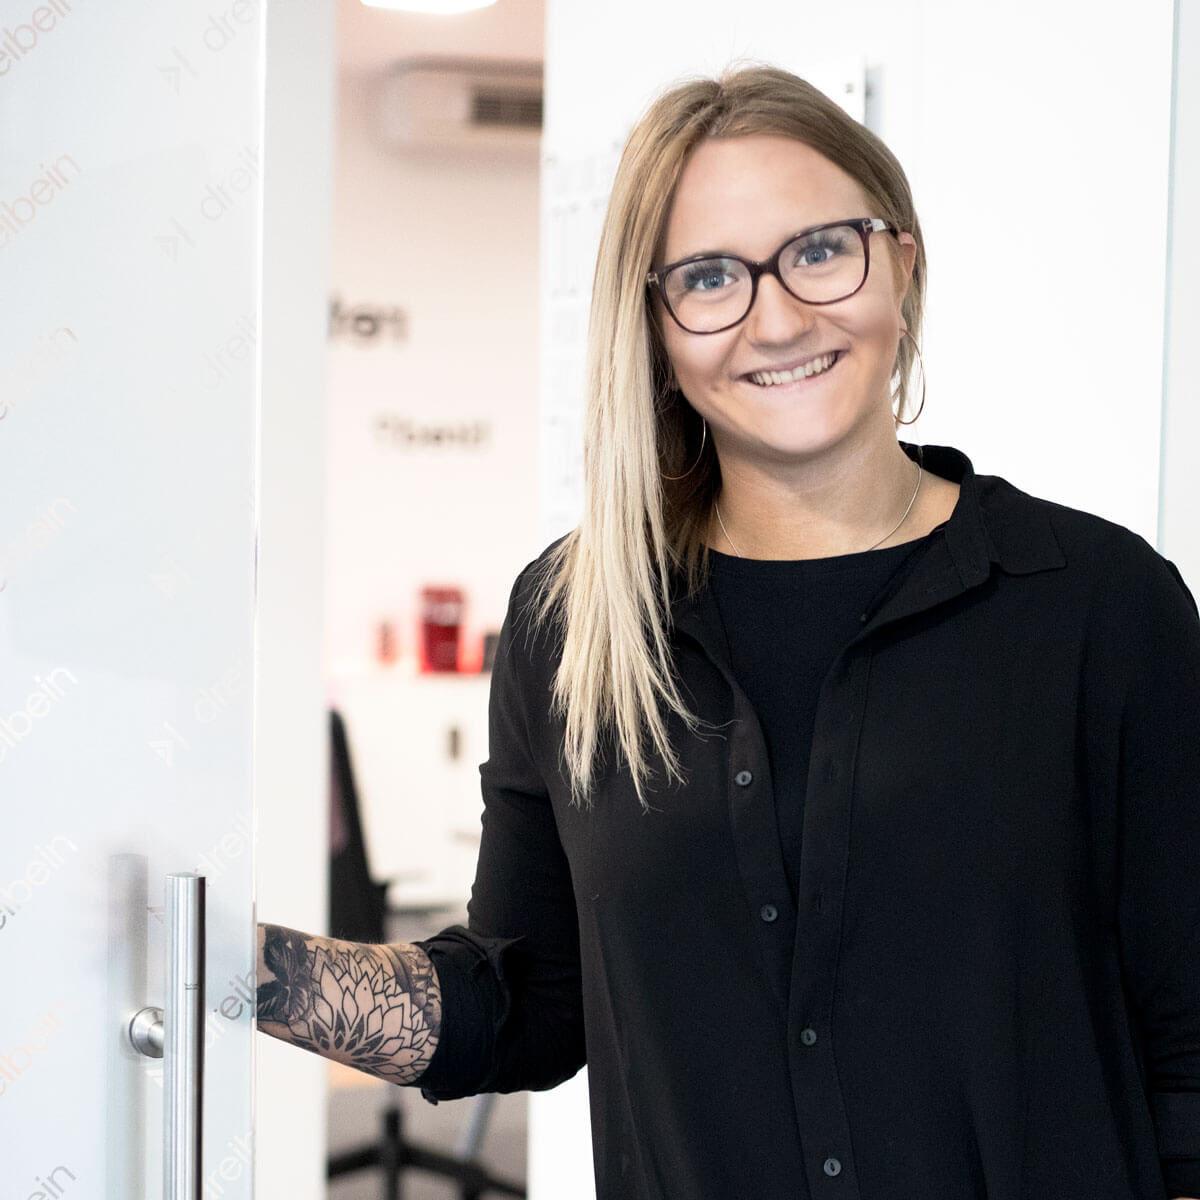 Pia Blühmelhuber